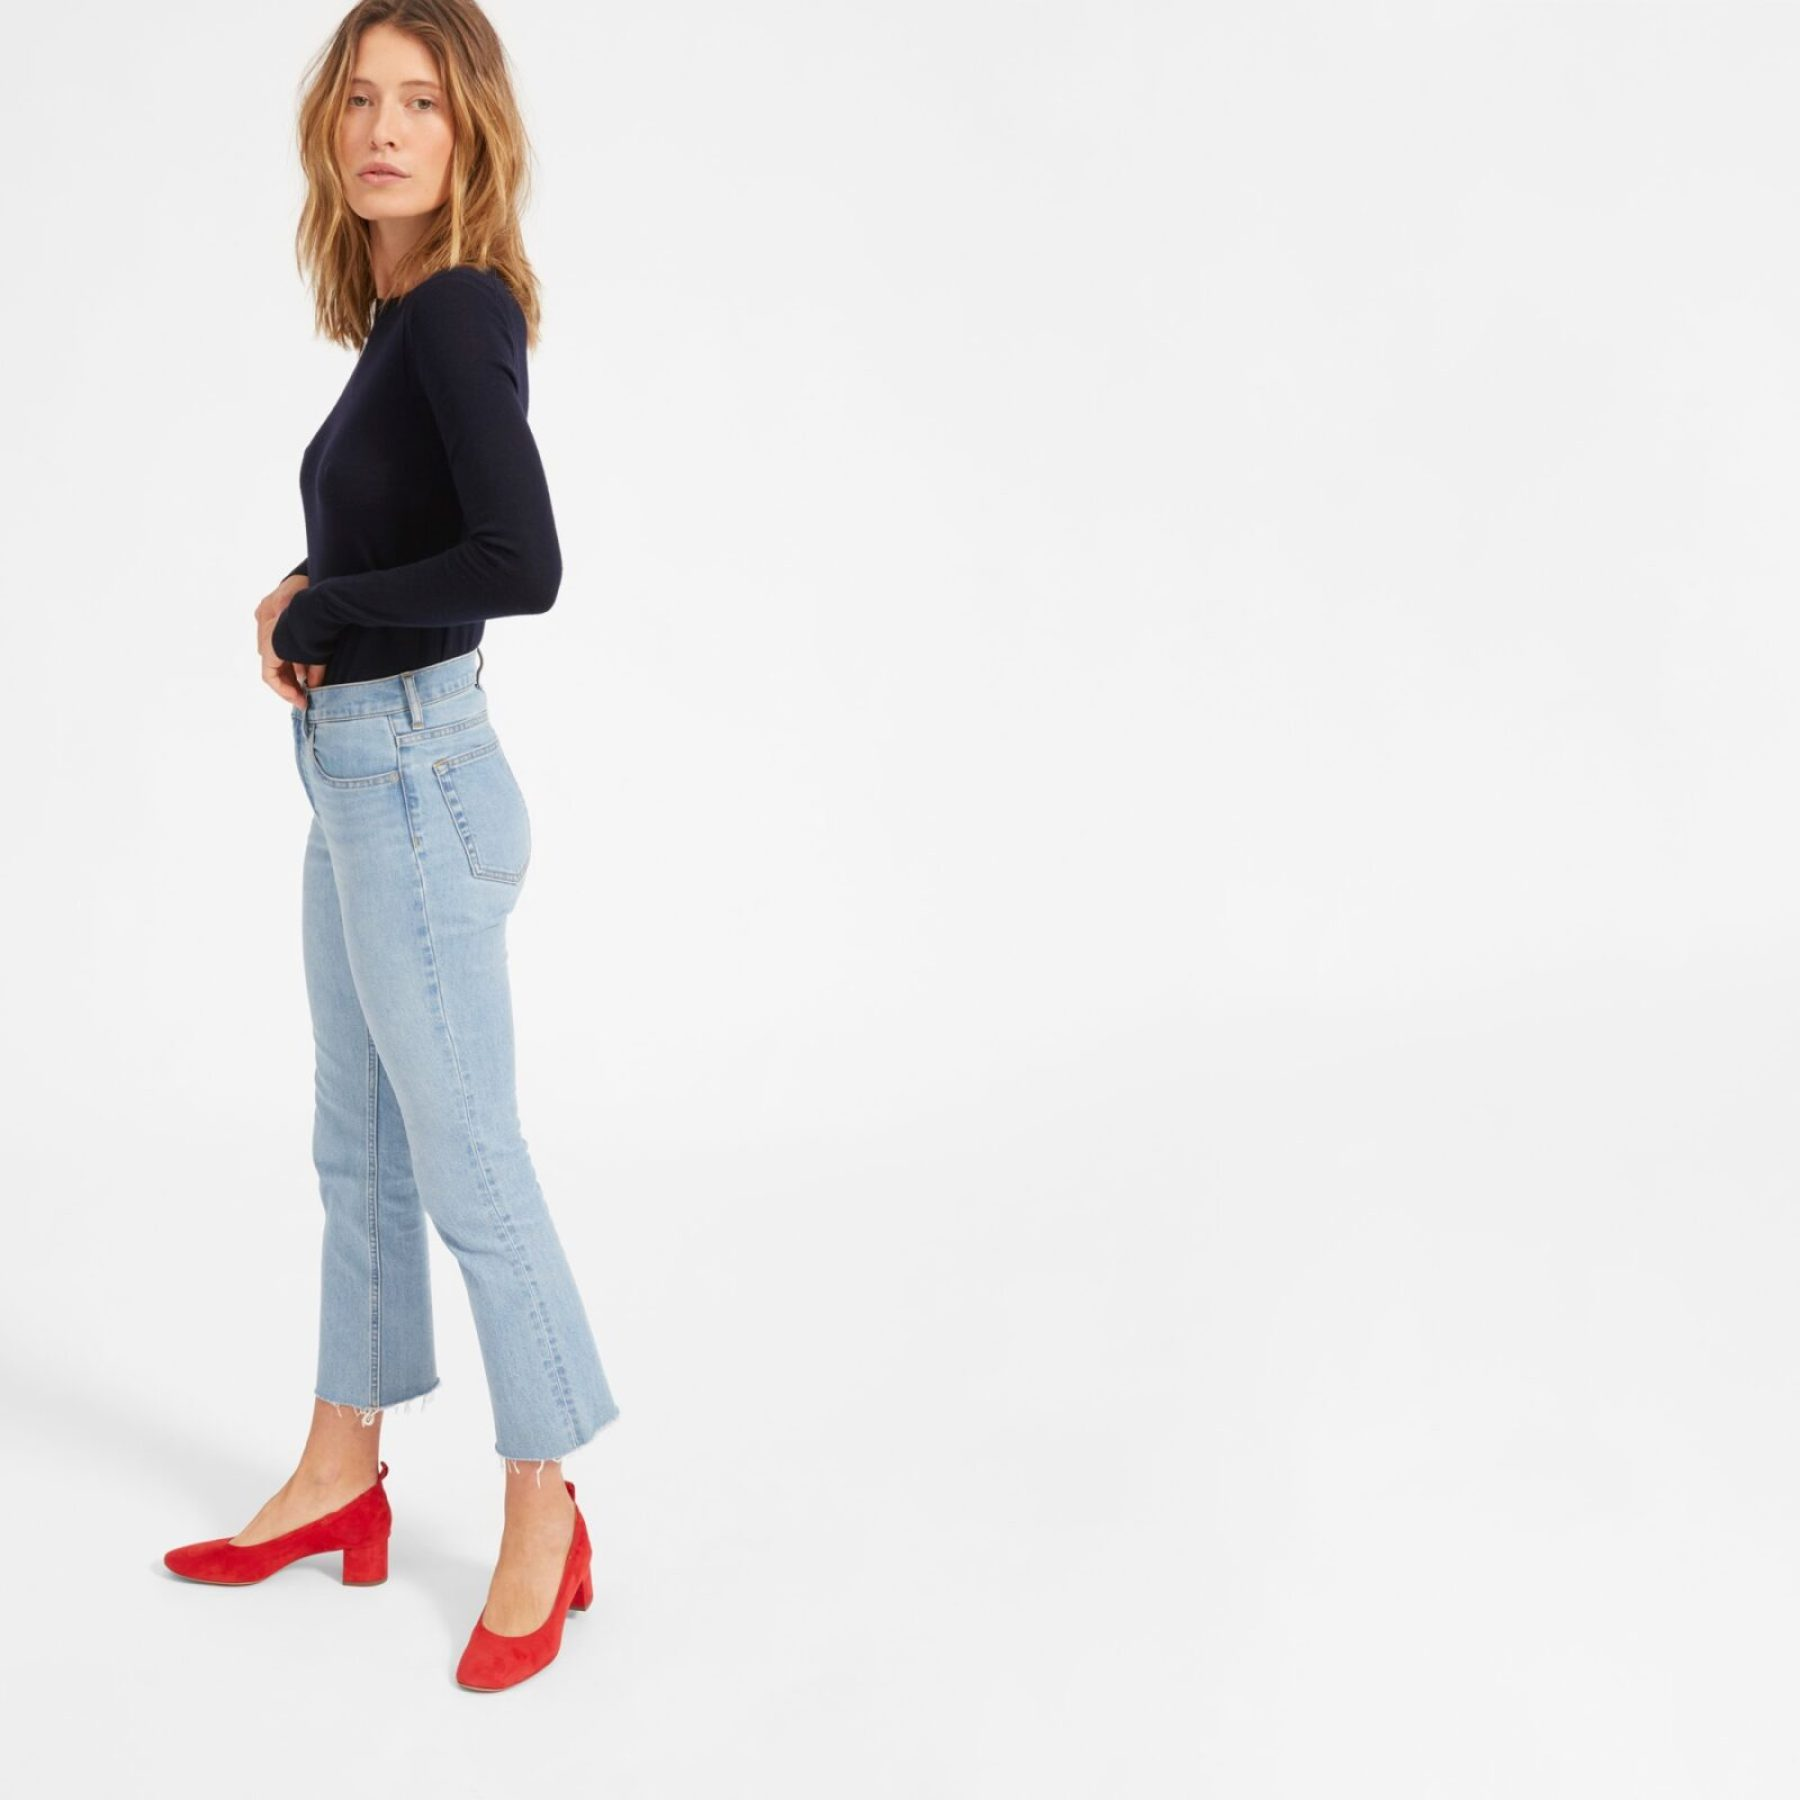 Everlane Kick Crop Jeans